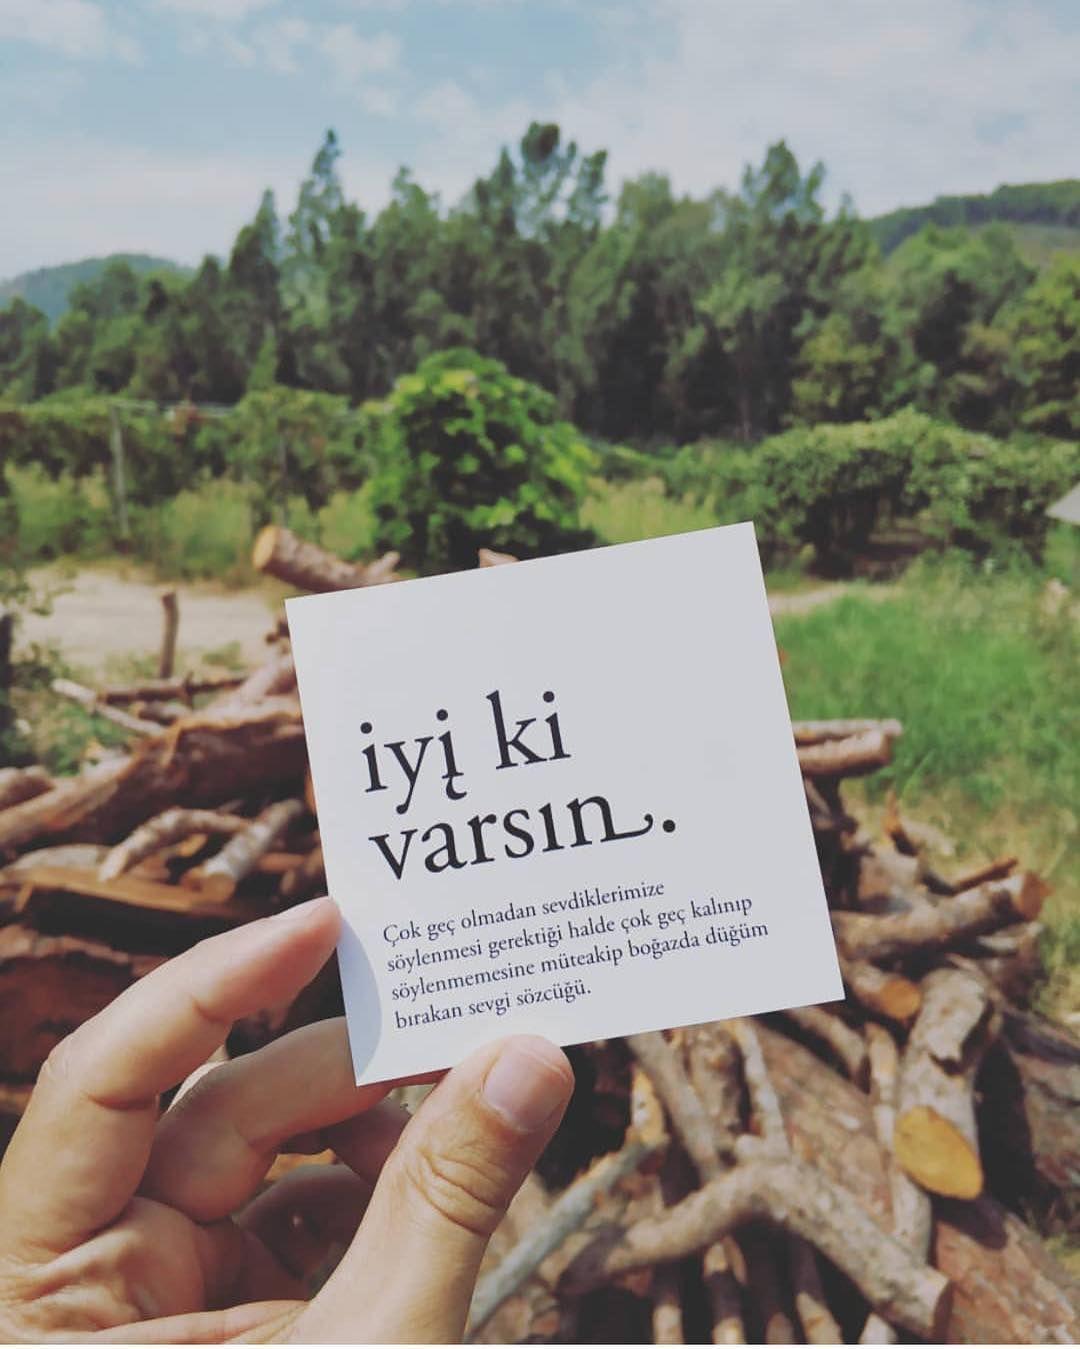 Ayet Hadis Dua Sozler Ahiret Allahuekber Amin Ayet Cehennem Cennet Corekotuyagi Dunya Elhamdulillah Ezan Foll Cool Words Turkish Quotes Magic Words